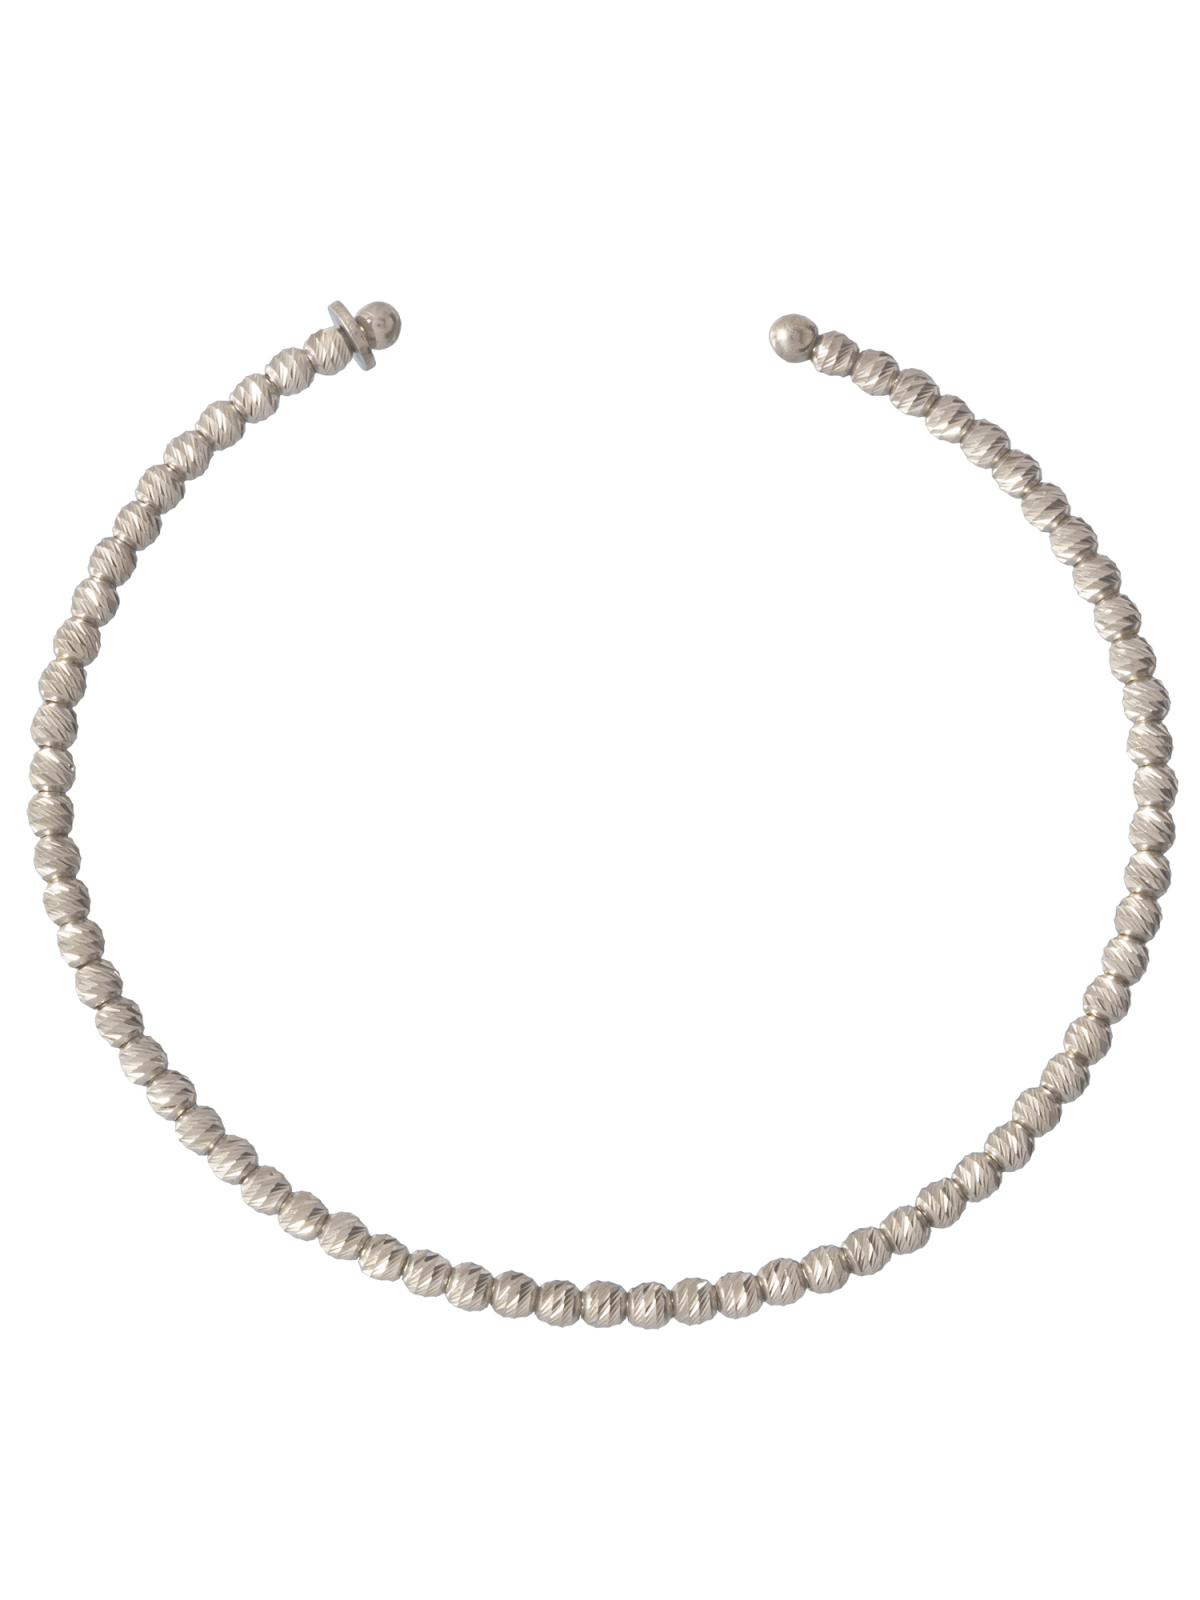 Diamond Cut Bead Bangle Bracelet